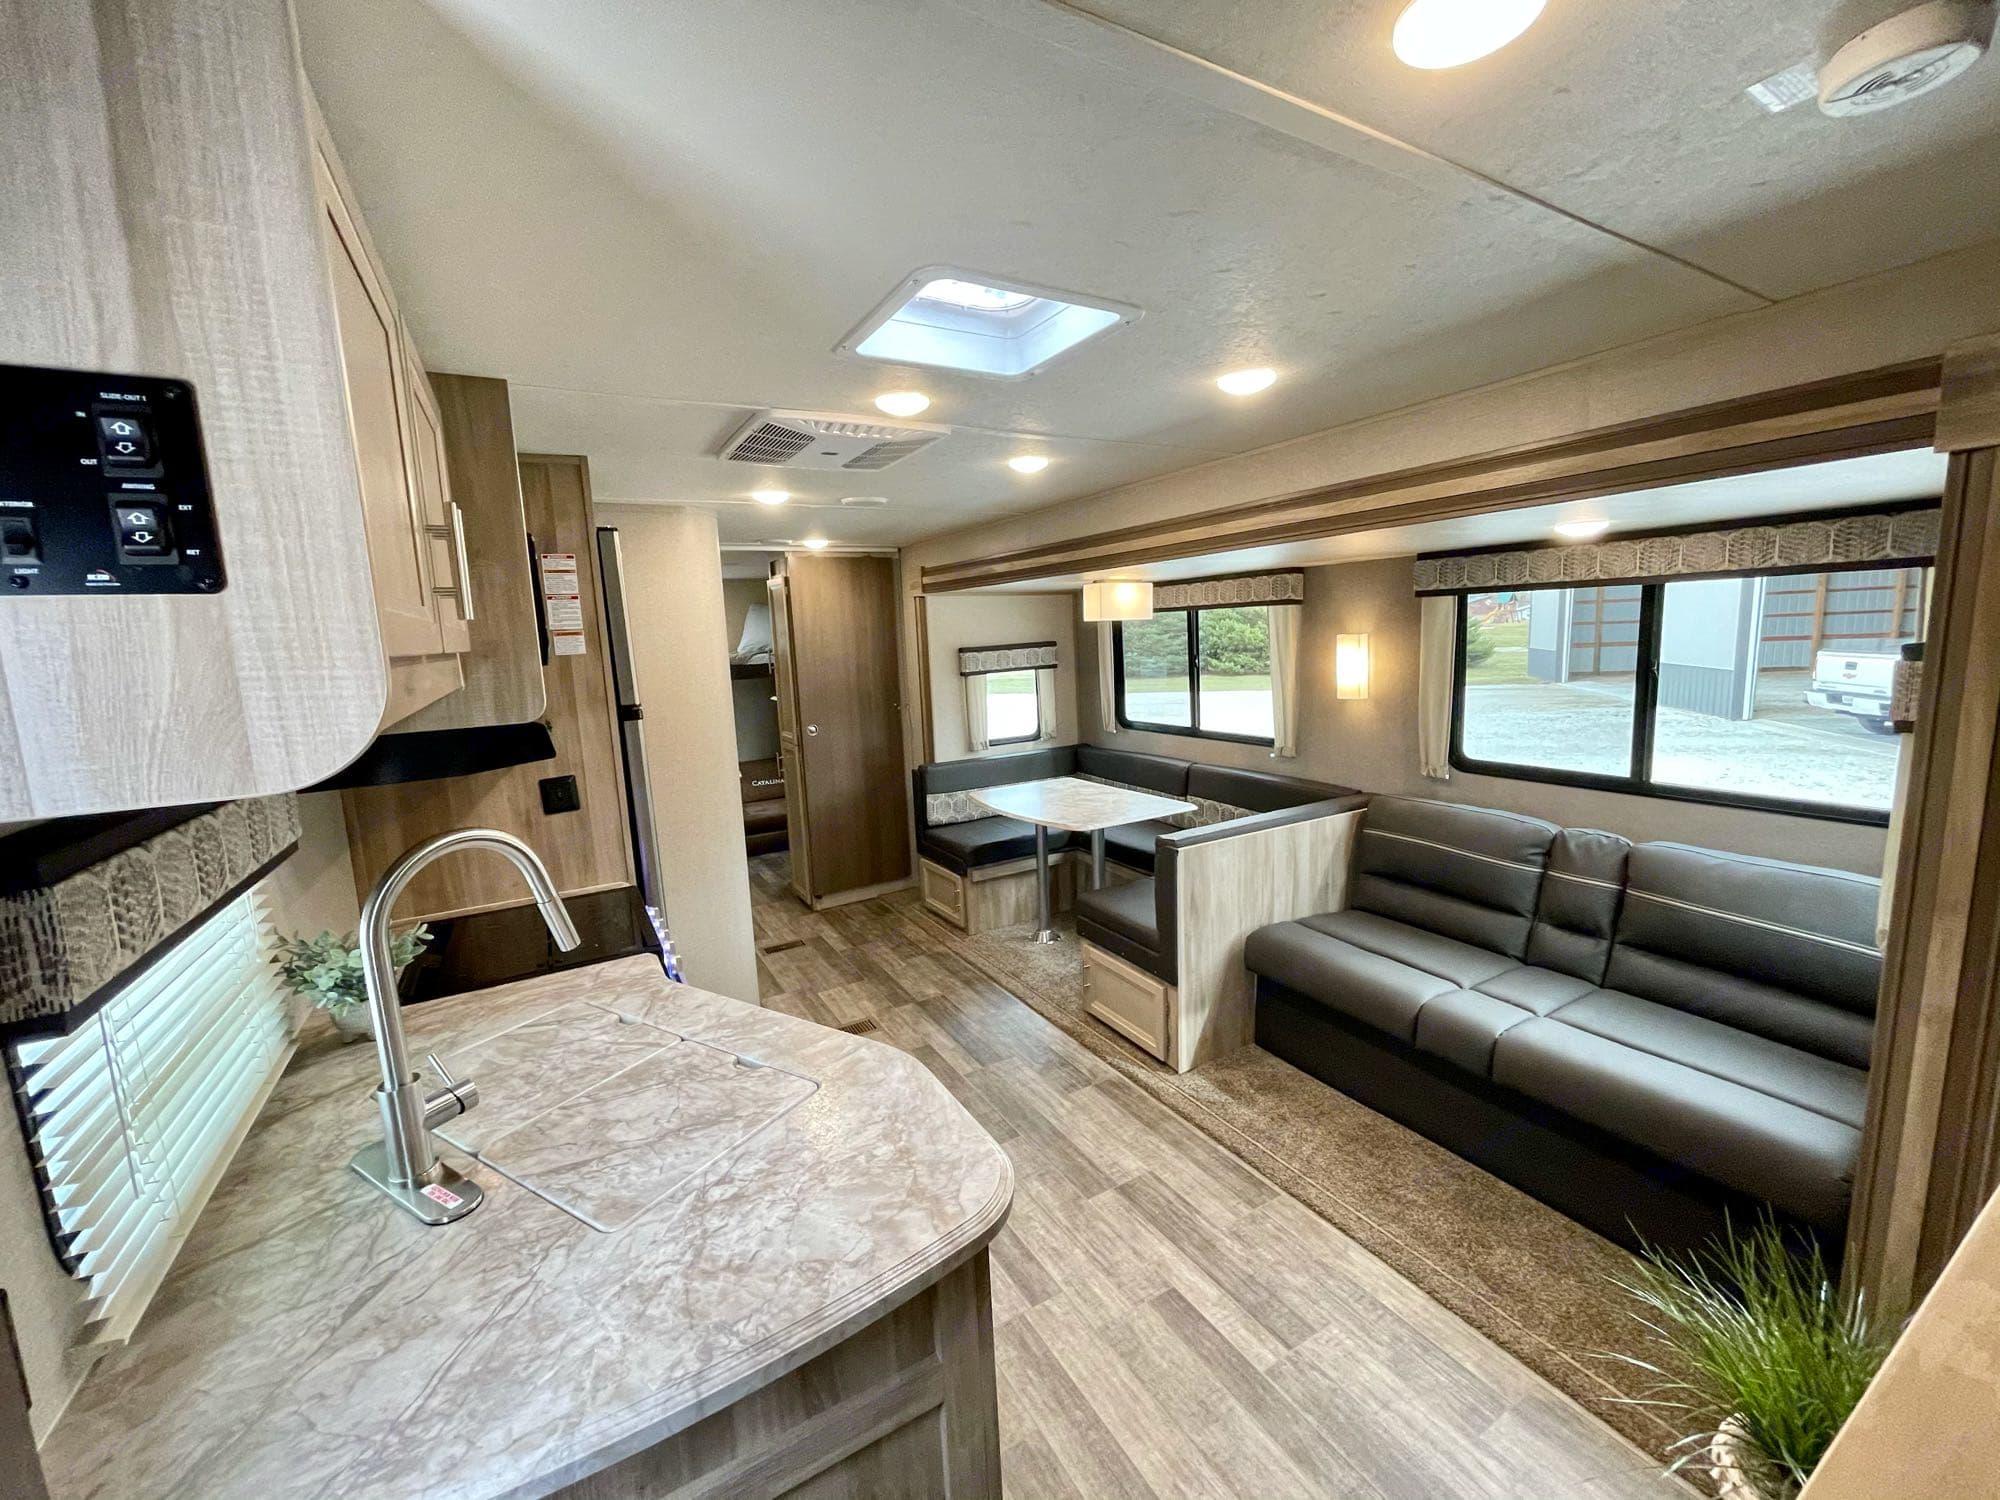 living area/kitchen. u-shaped dinette, gas stove, oven, microwave. Coachmen Catalina 293QBCK 2021